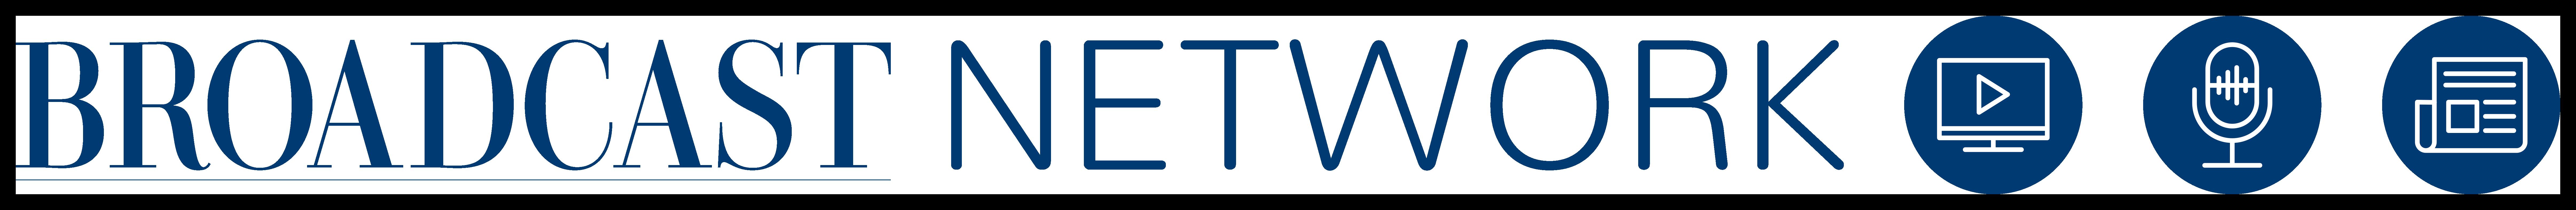 Broadcast Network logo